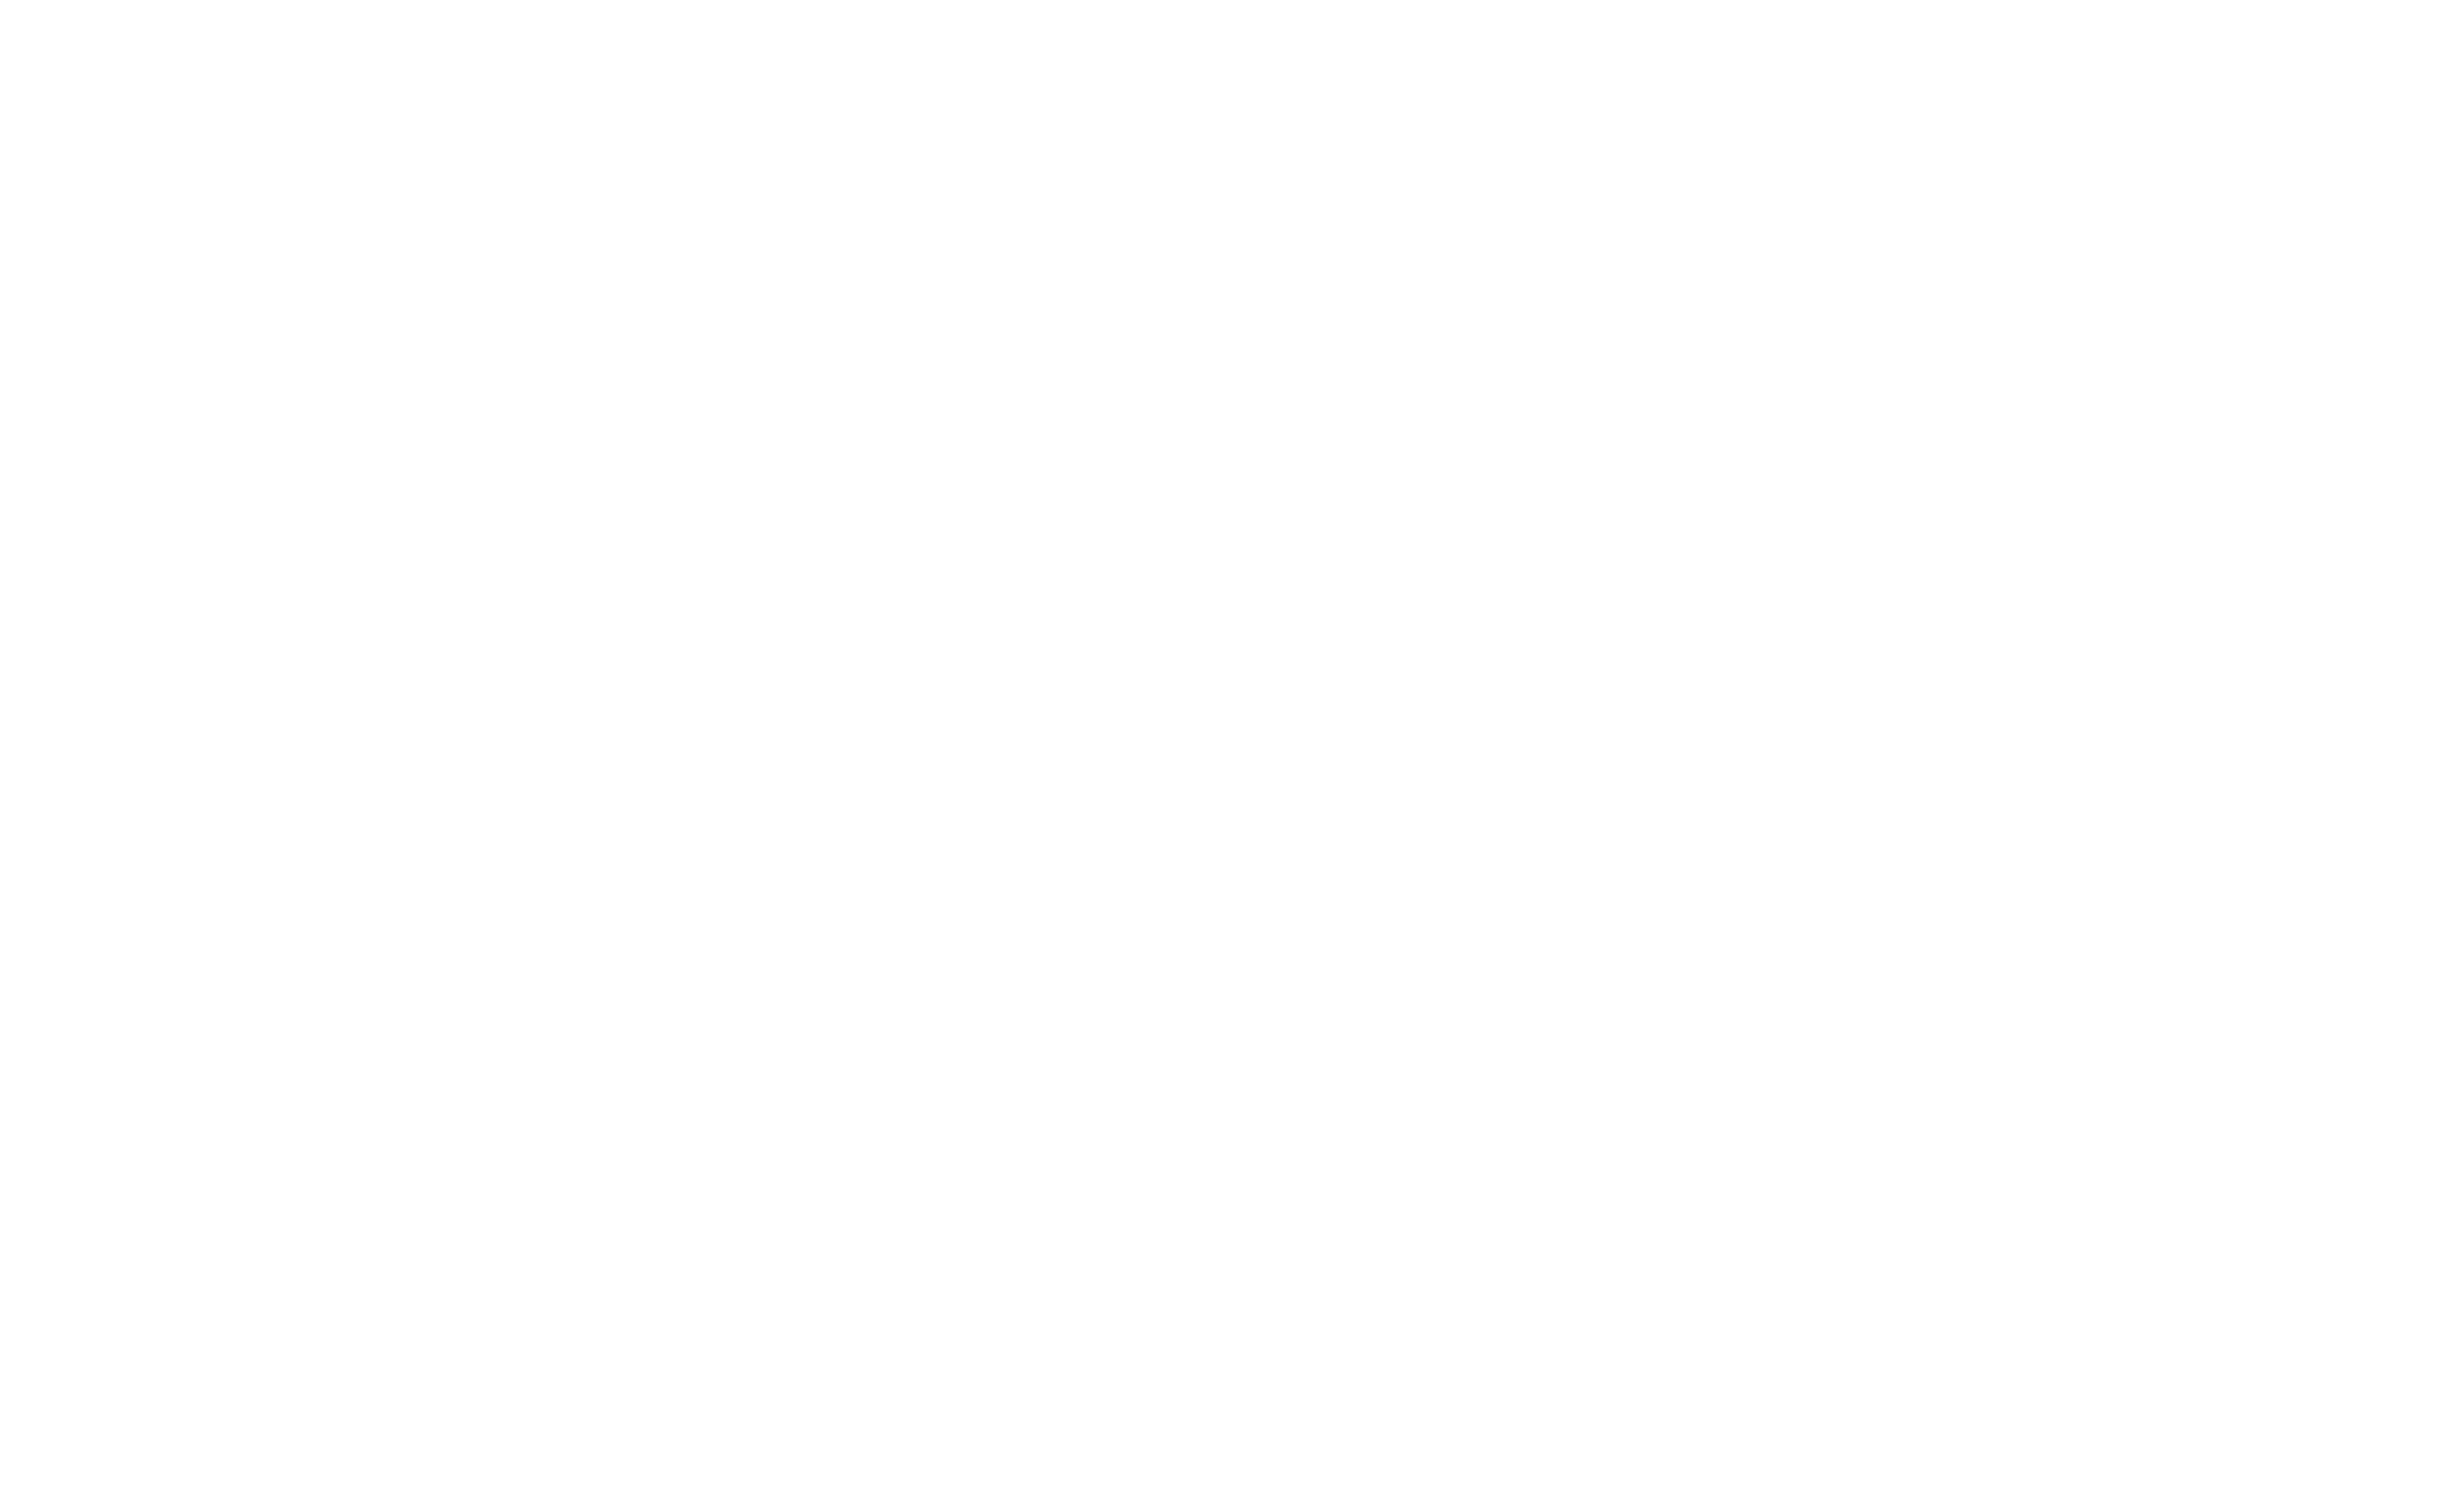 Žito grupa logo